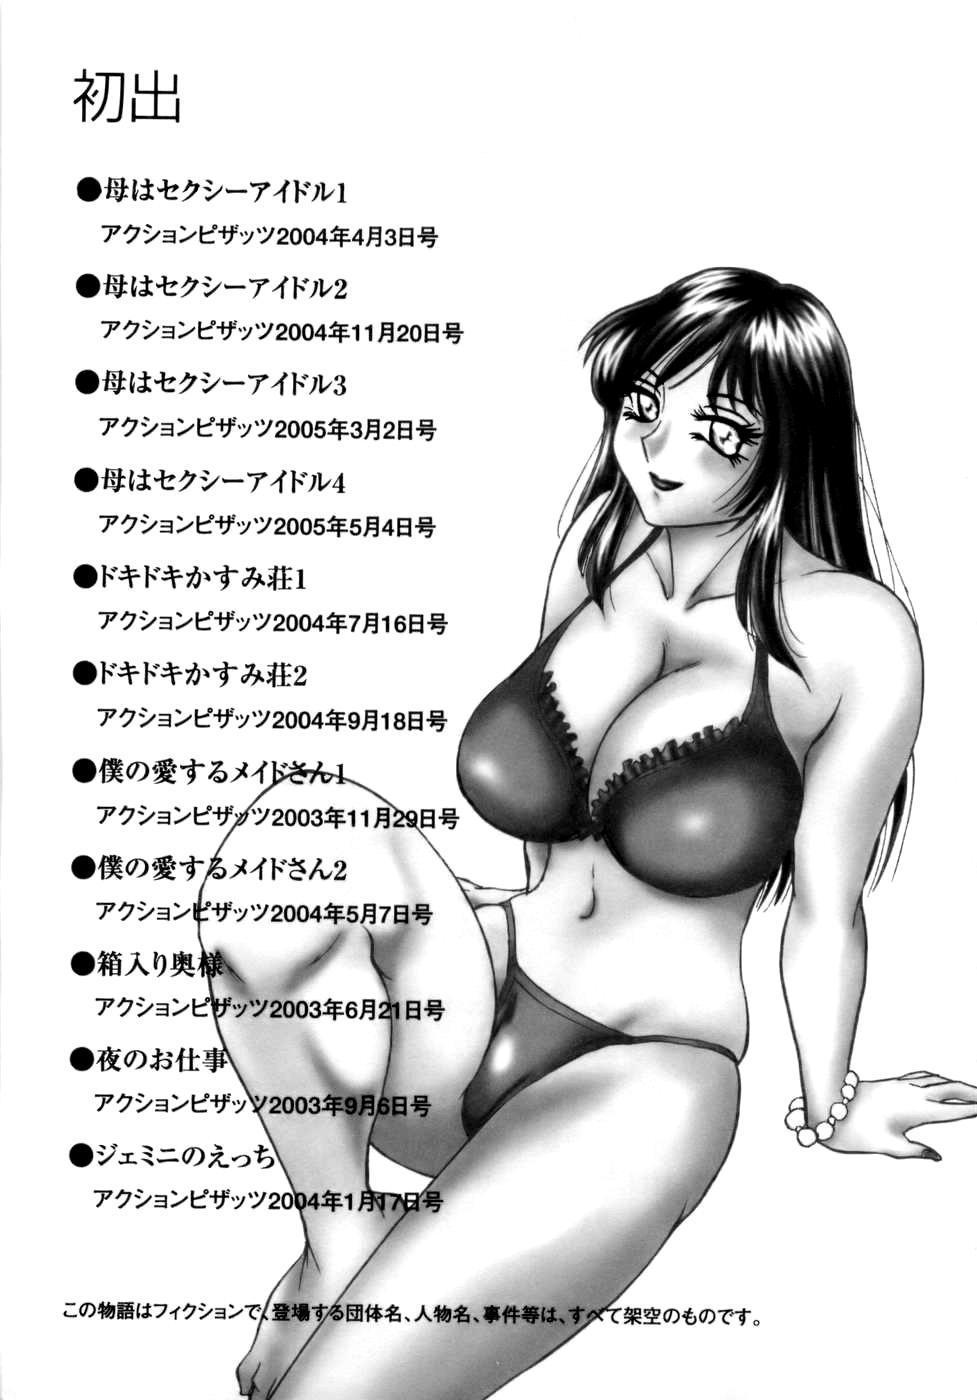 Haha wa Sexy Idol | My Mom, The Sexy Idol 209